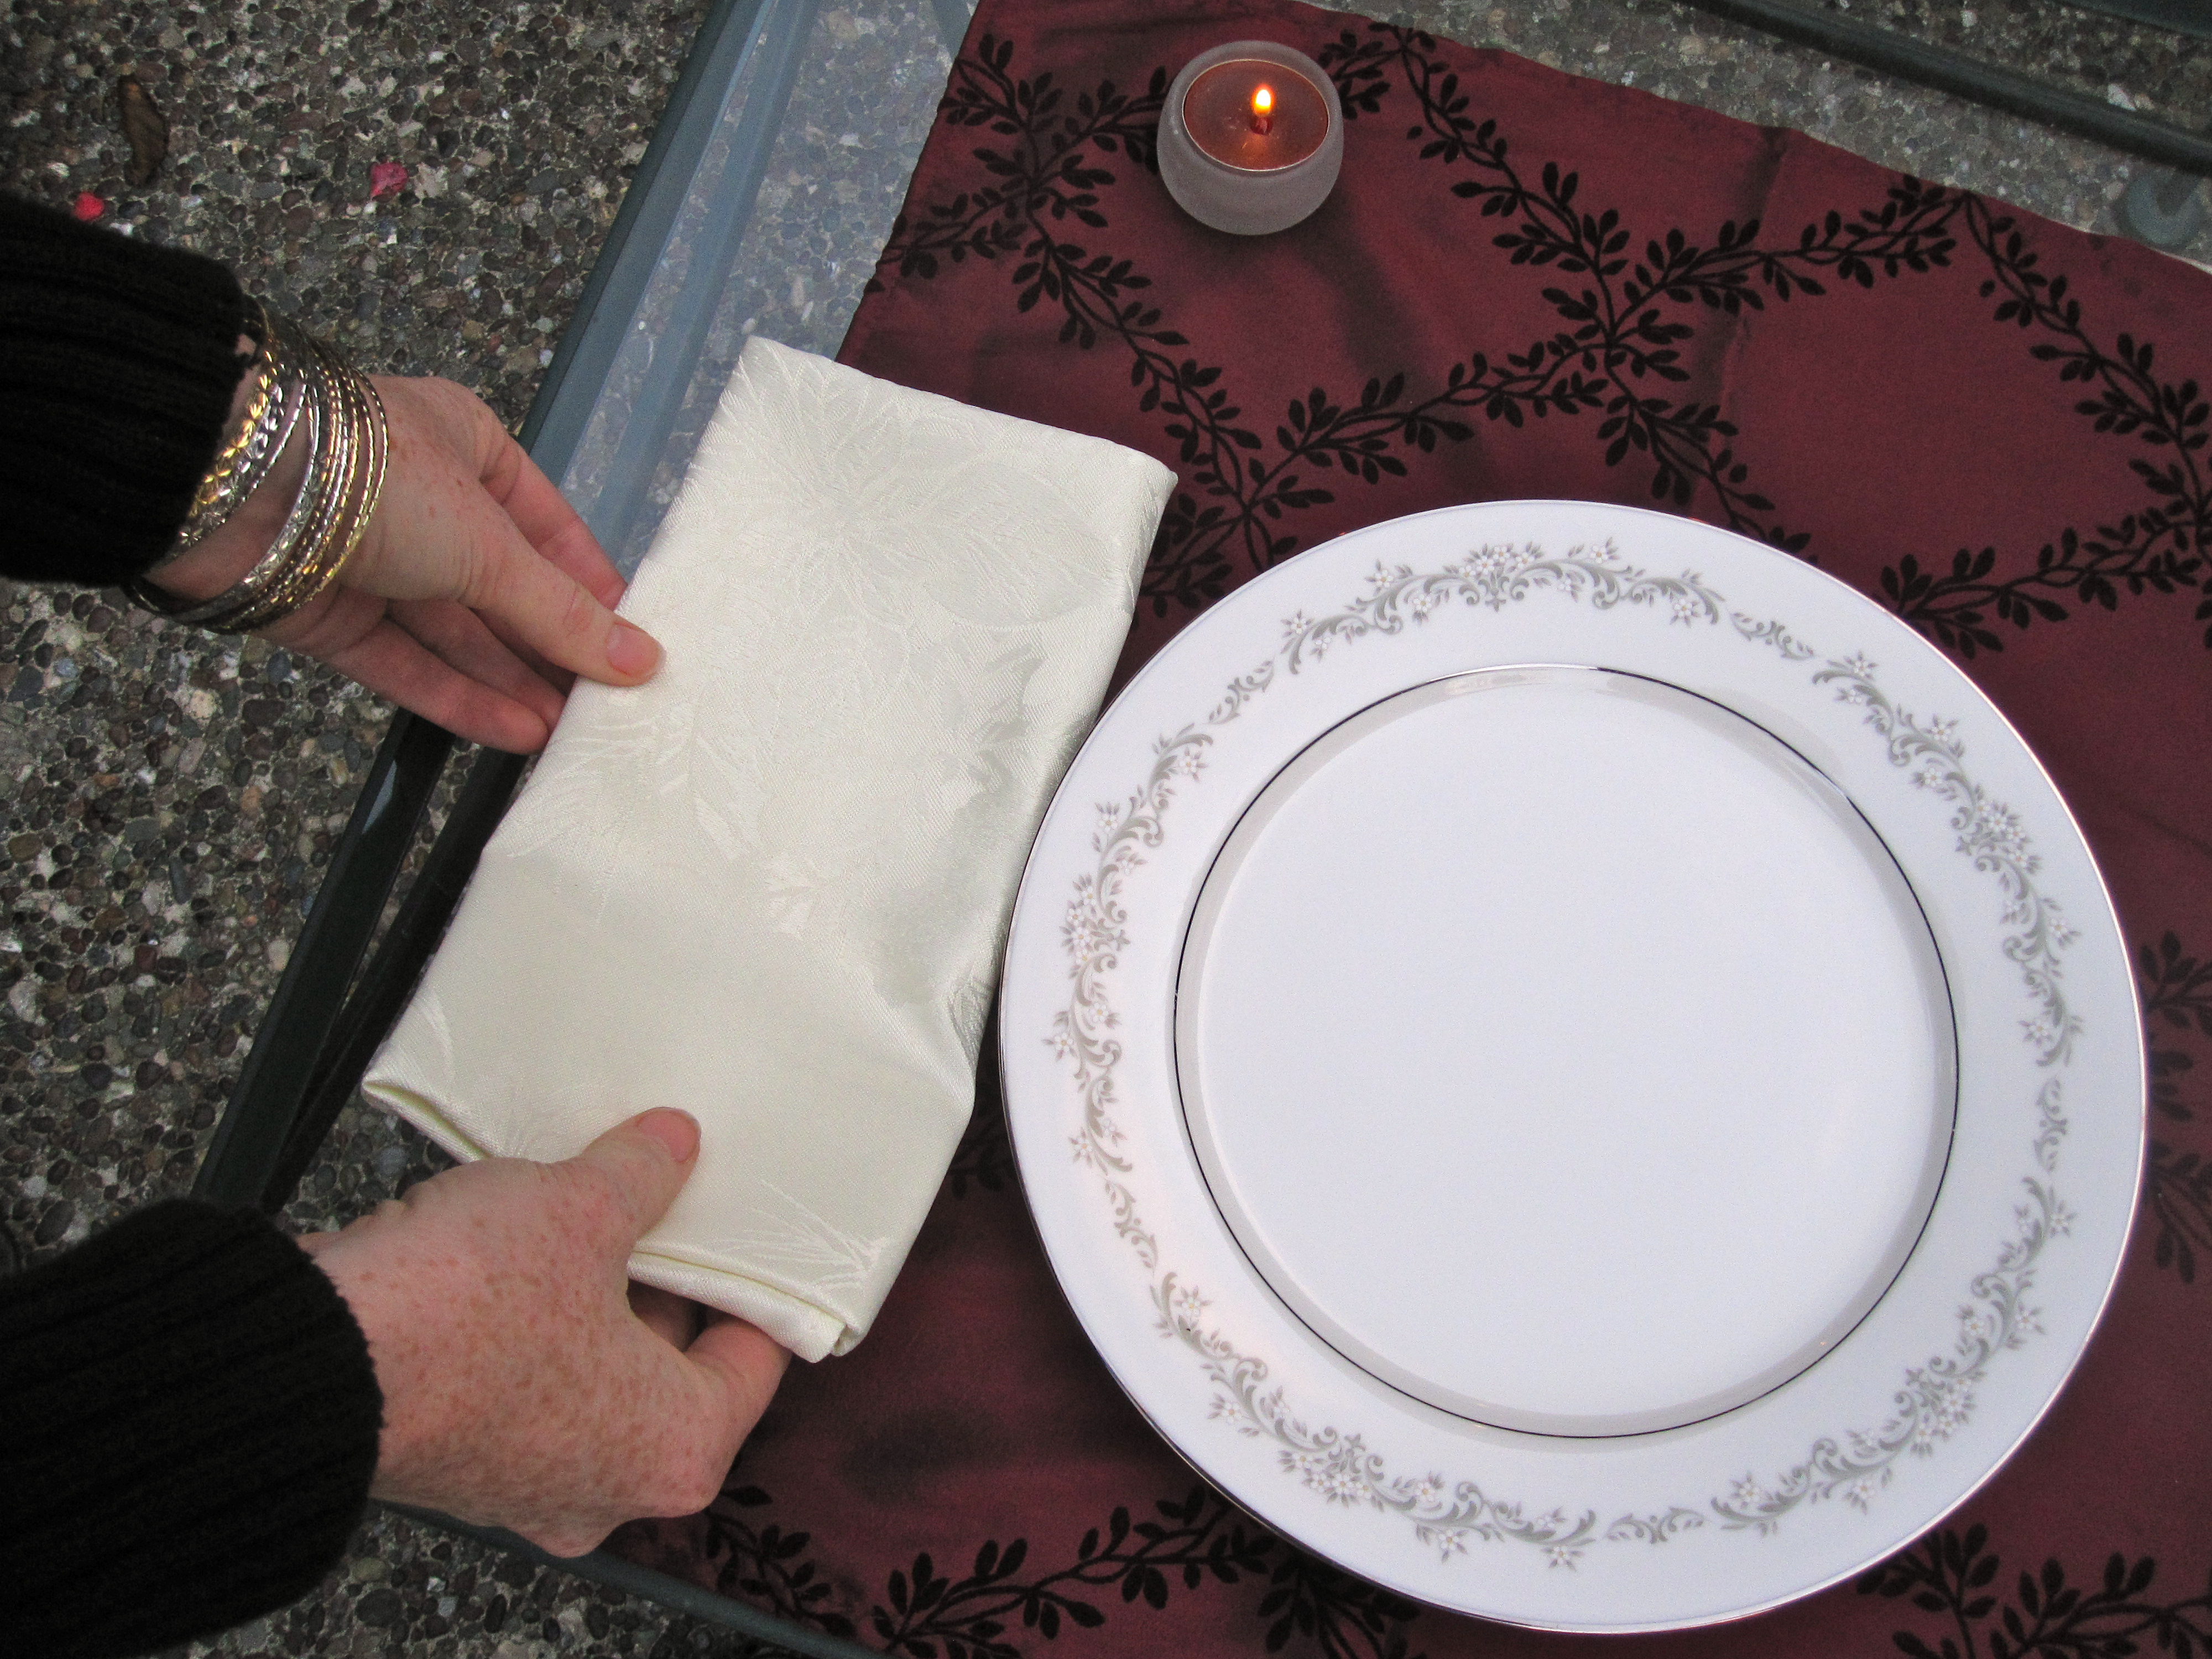 Set the napkin down.